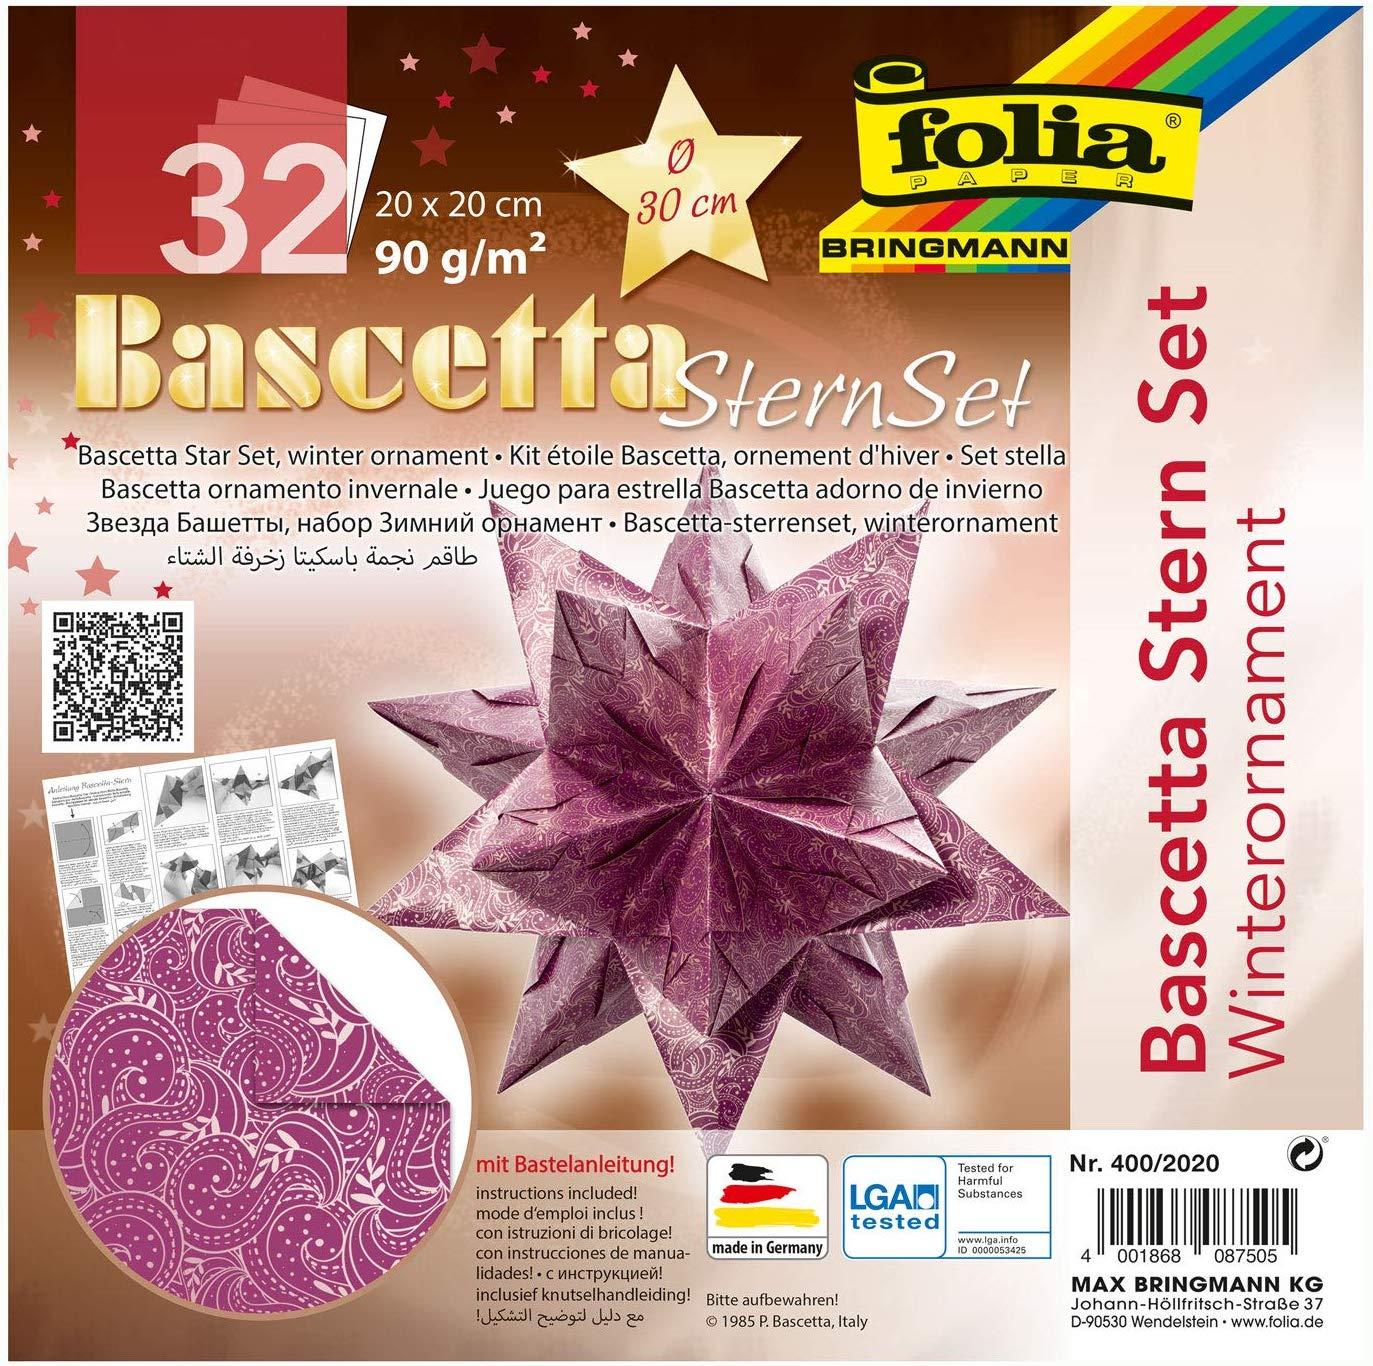 folia 400/2020 - Bastelset Bascetta Stern Winterornament lila/silber, 32 Blatt, 20 x 20 cm, fertige